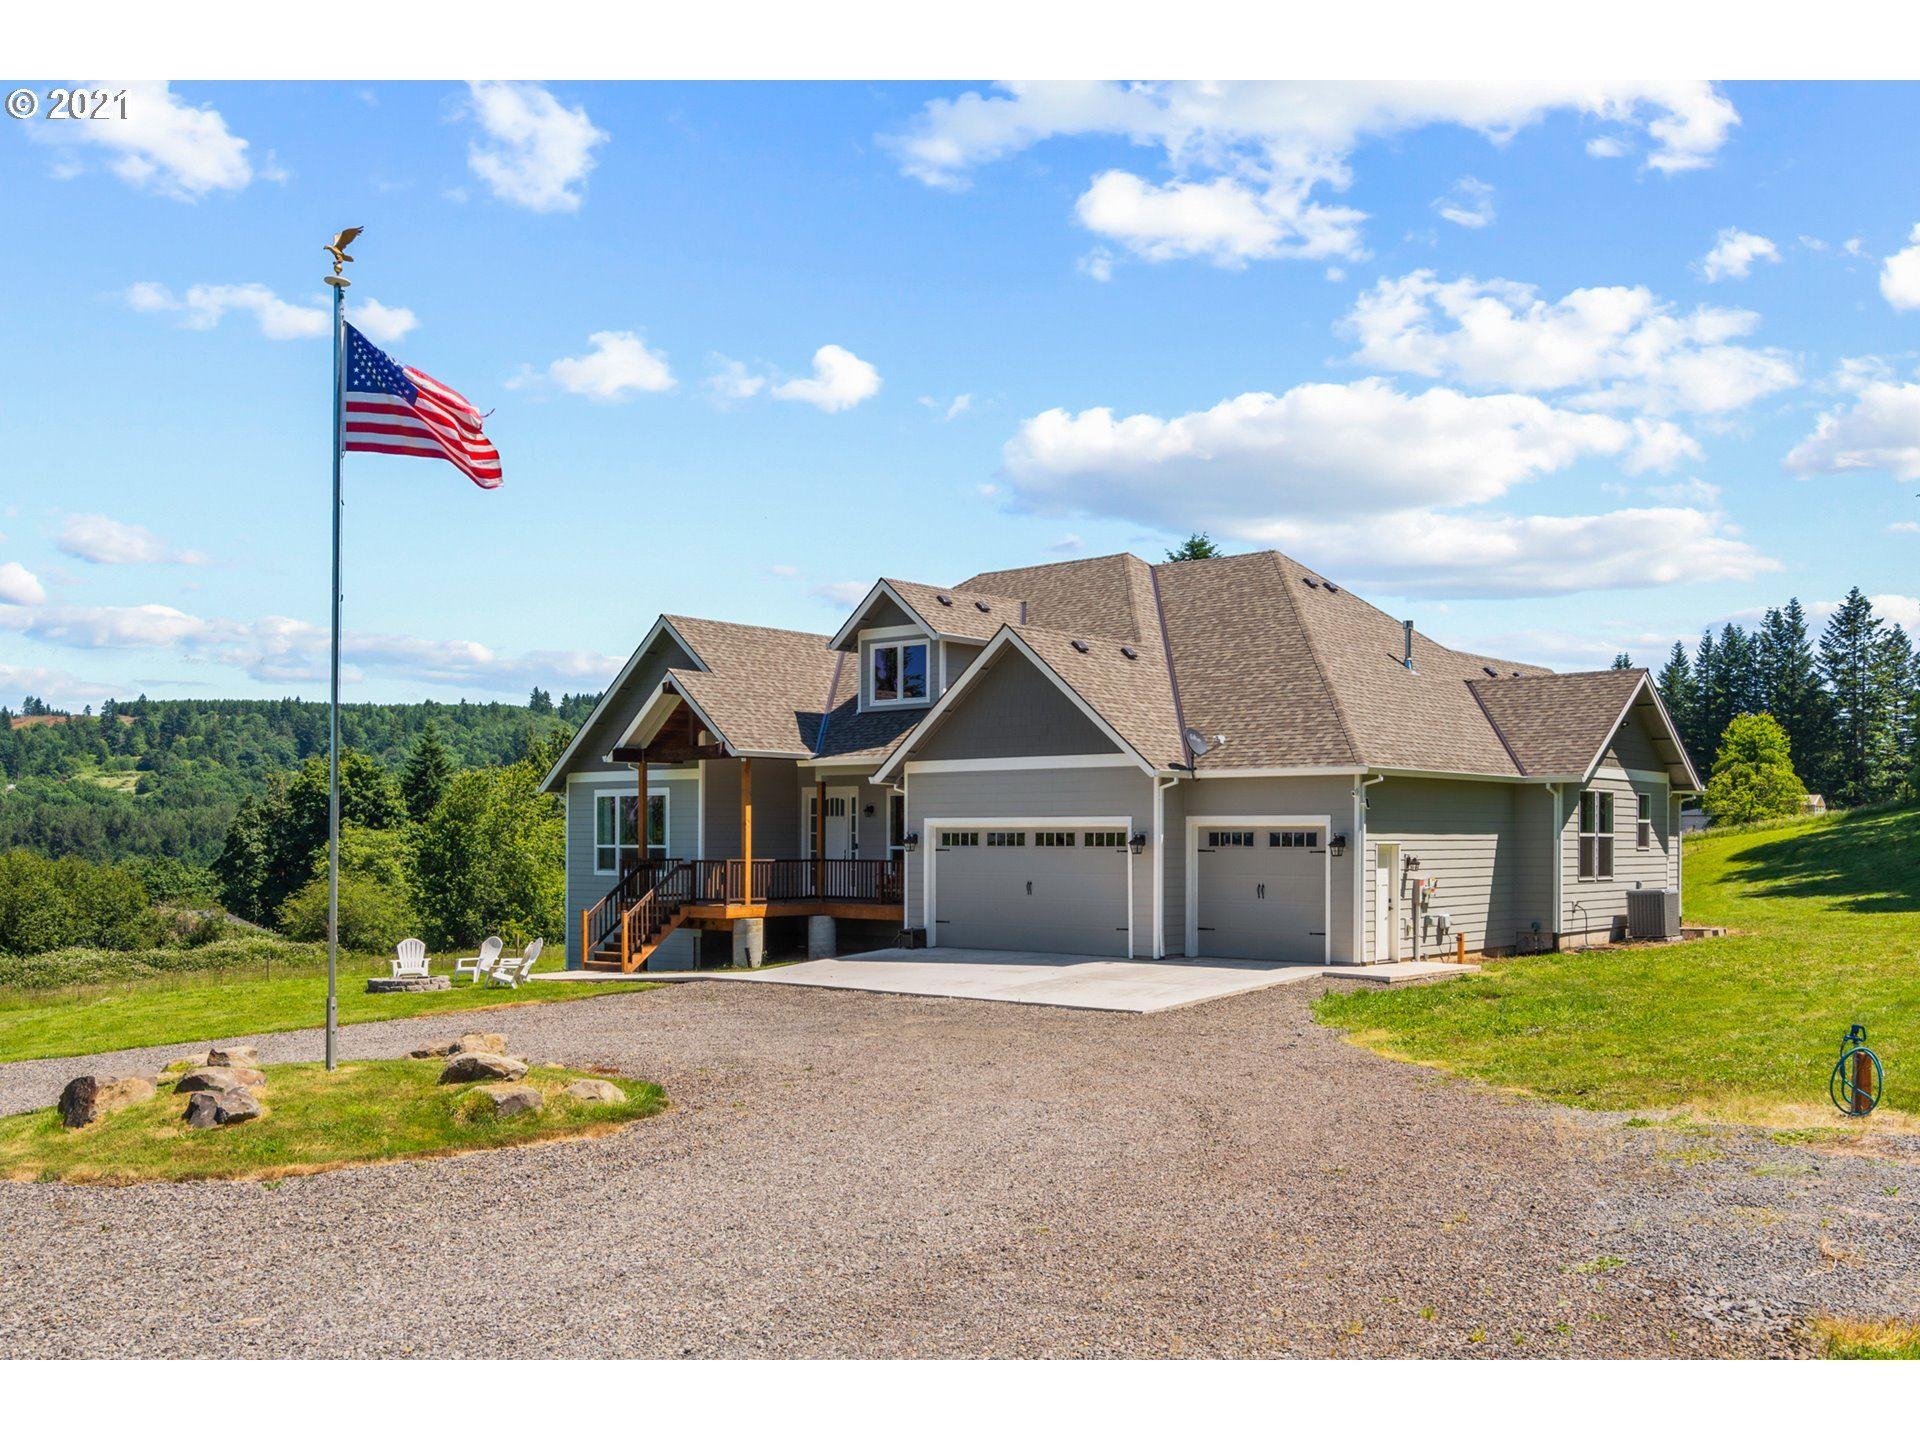 43205 SE COALMAN RD, Sandy, OR 97055 - MLS#: 21552204